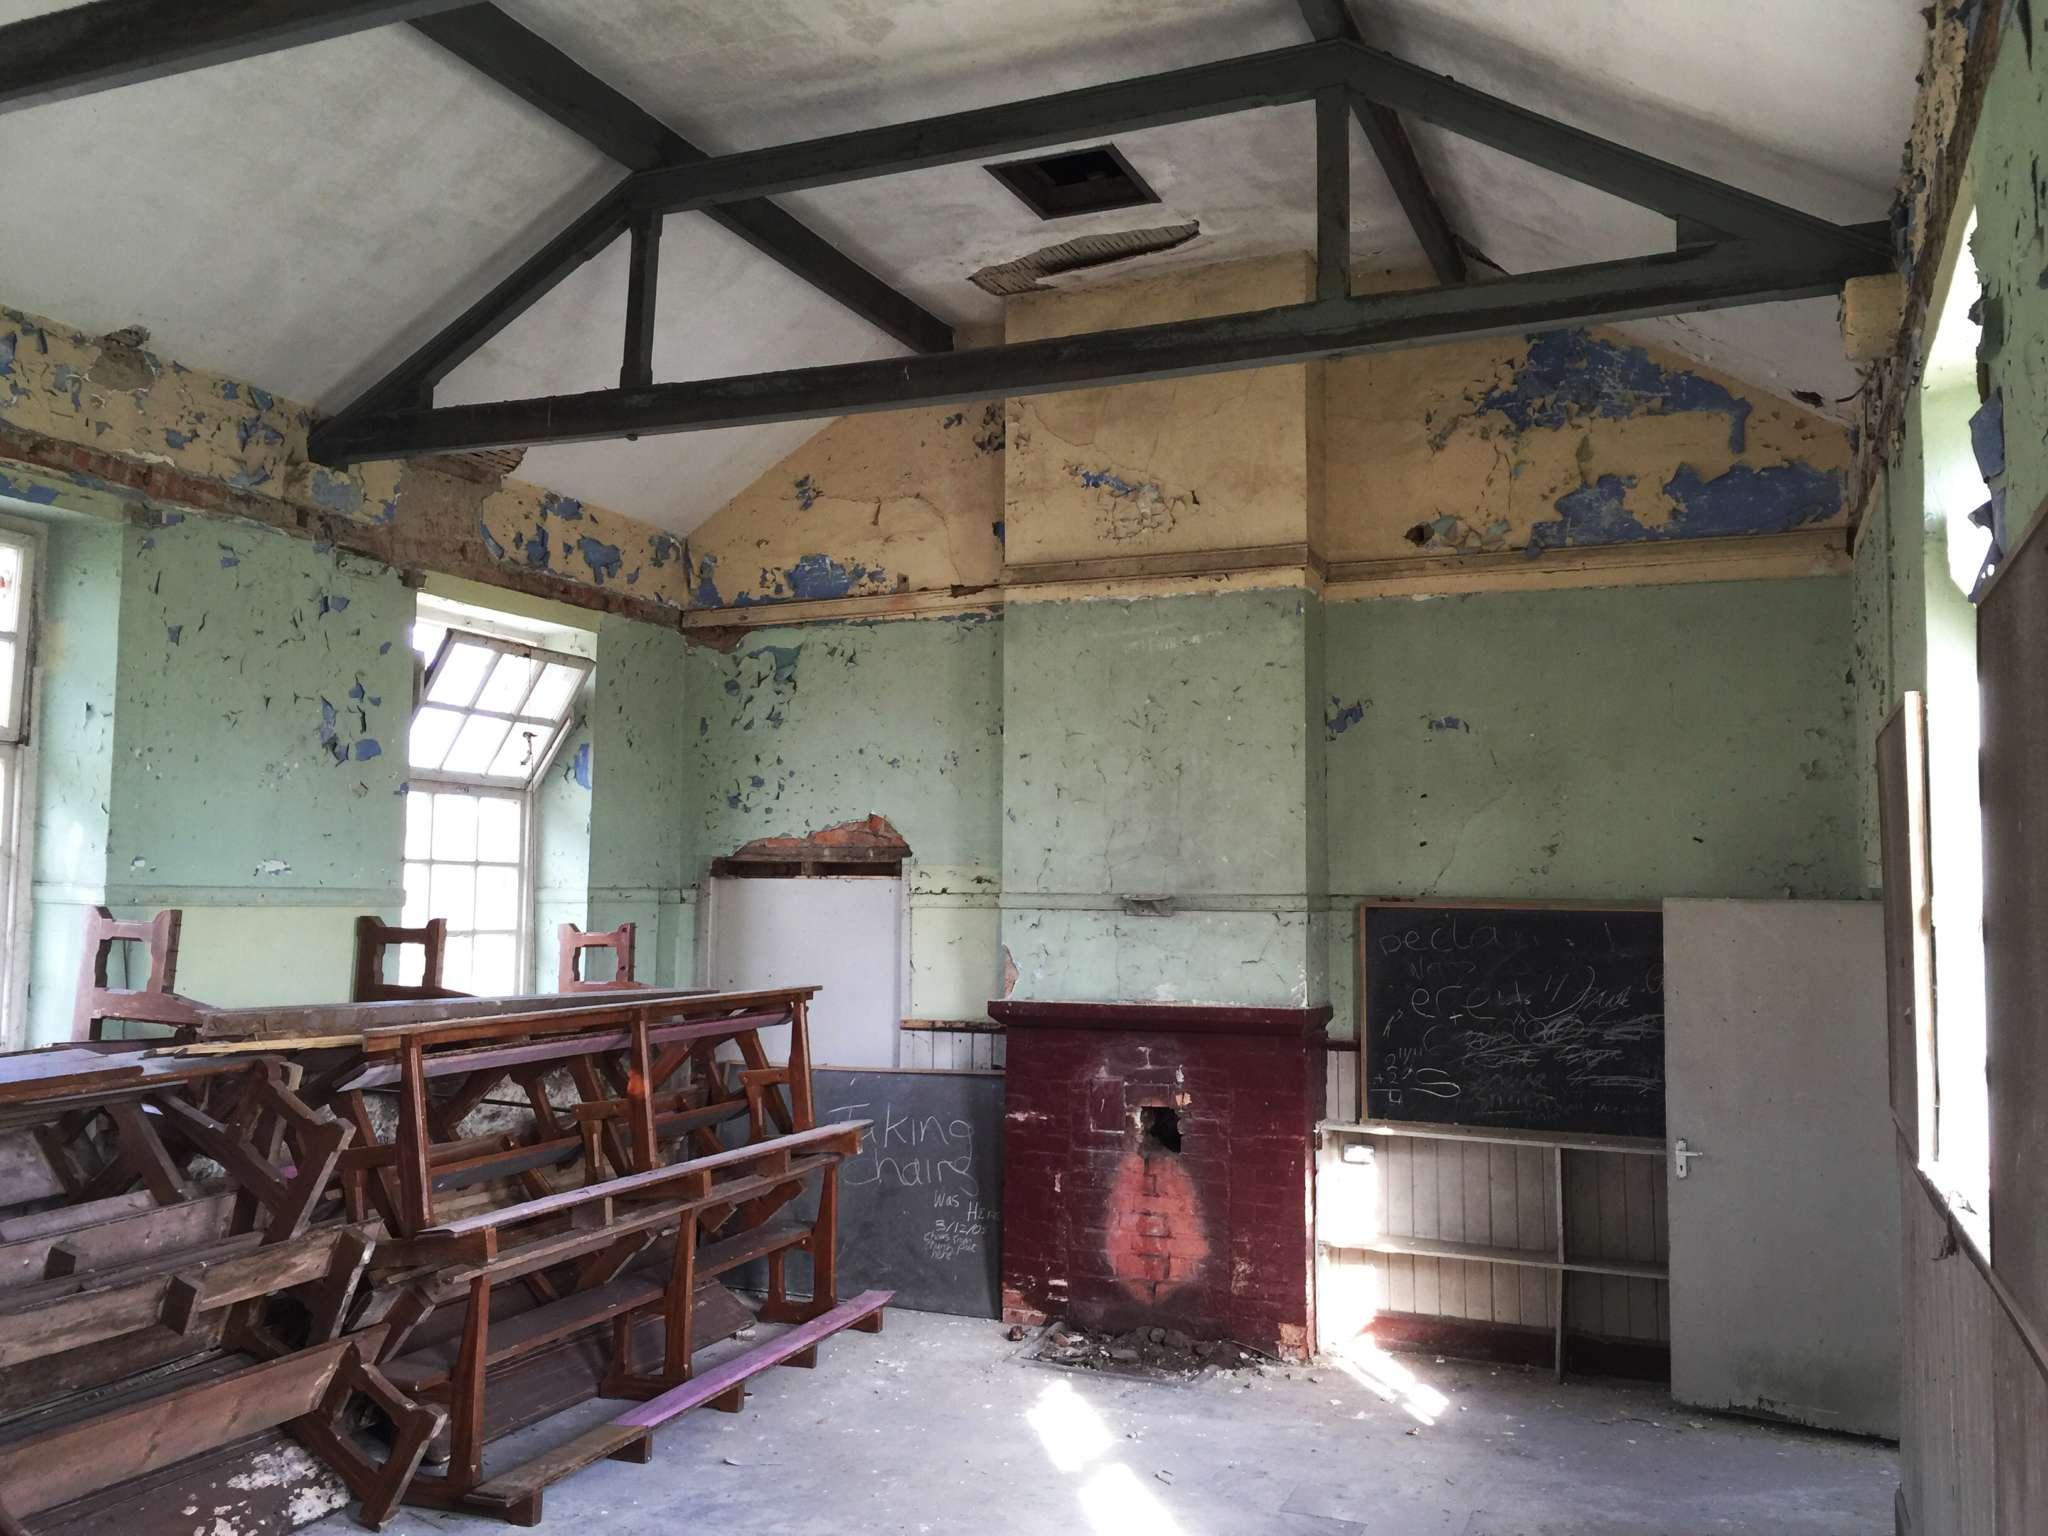 Killygarry School interior before restoration